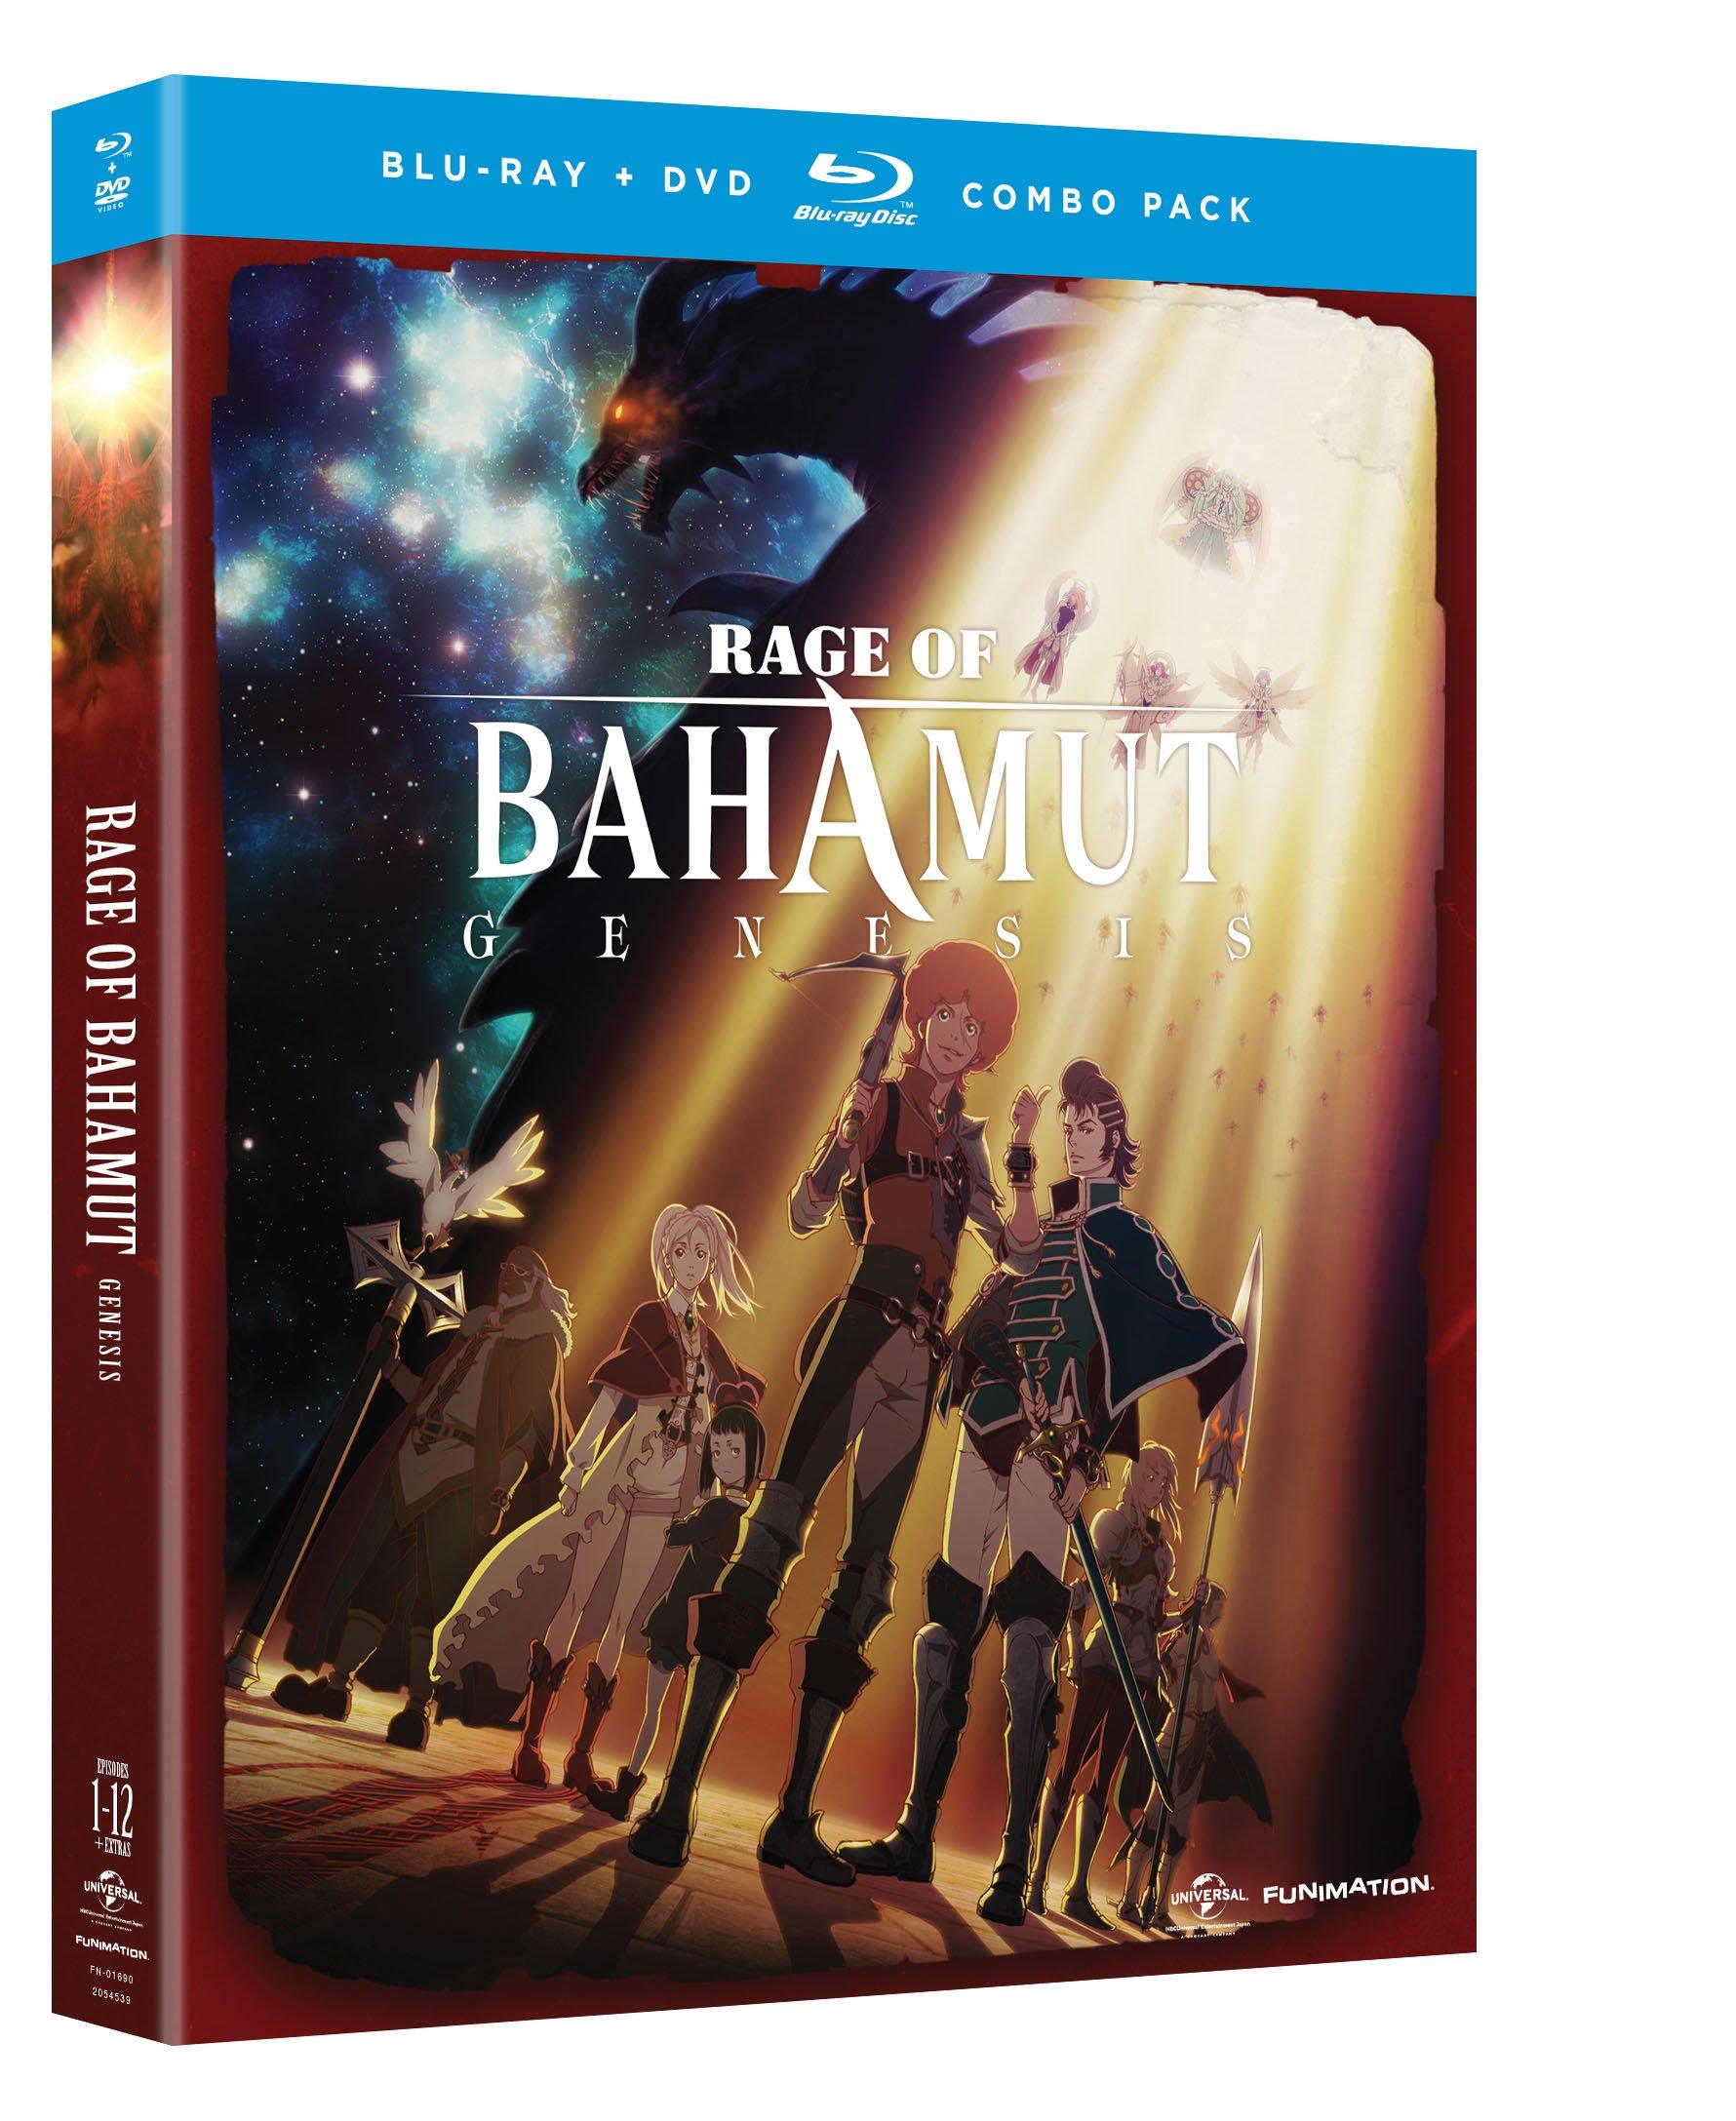 Blu-ray : Rage of Bahamut: Genesis - Season One (With DVD, 4 Disc)